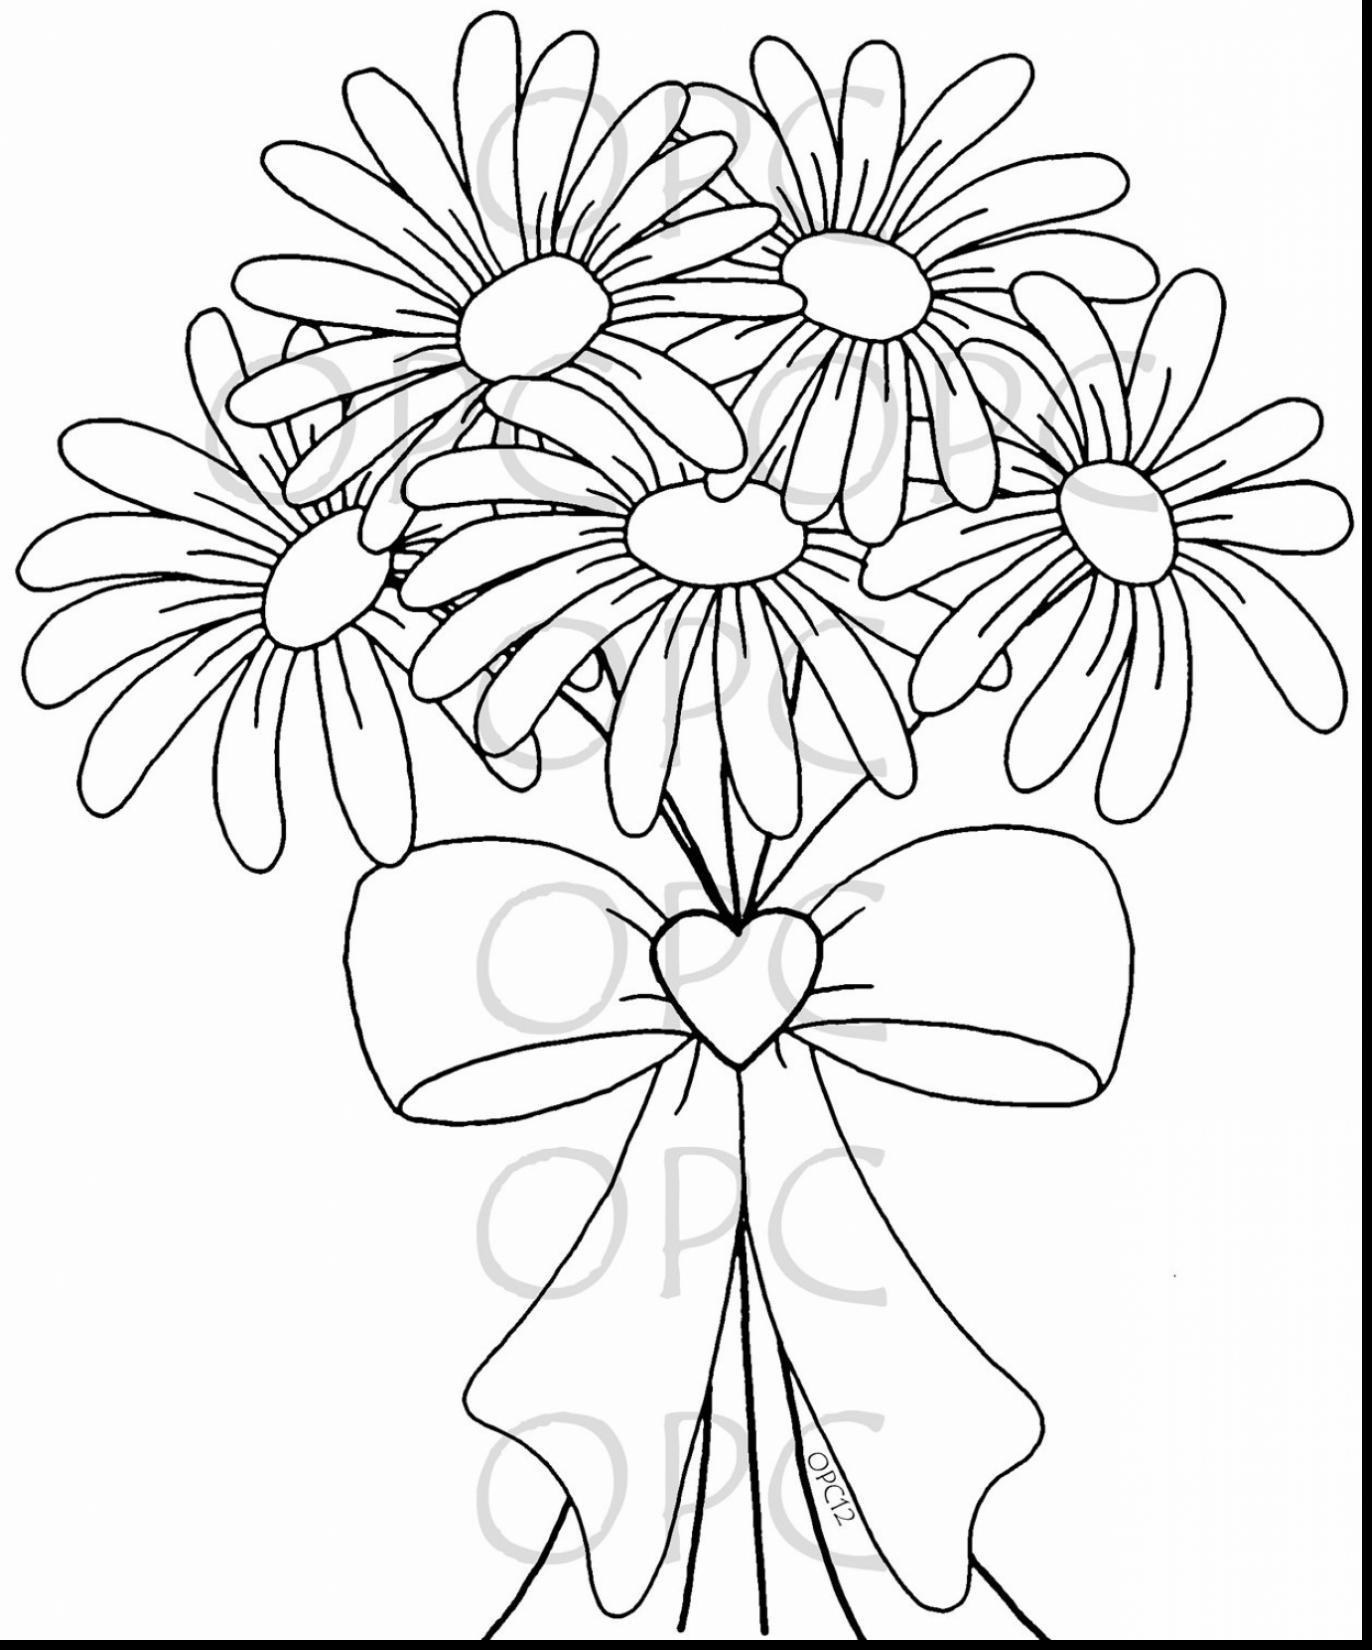 daisy flower colouring pages el cuento que no es cuento habla popular de lumbrales 95 pages colouring daisy flower